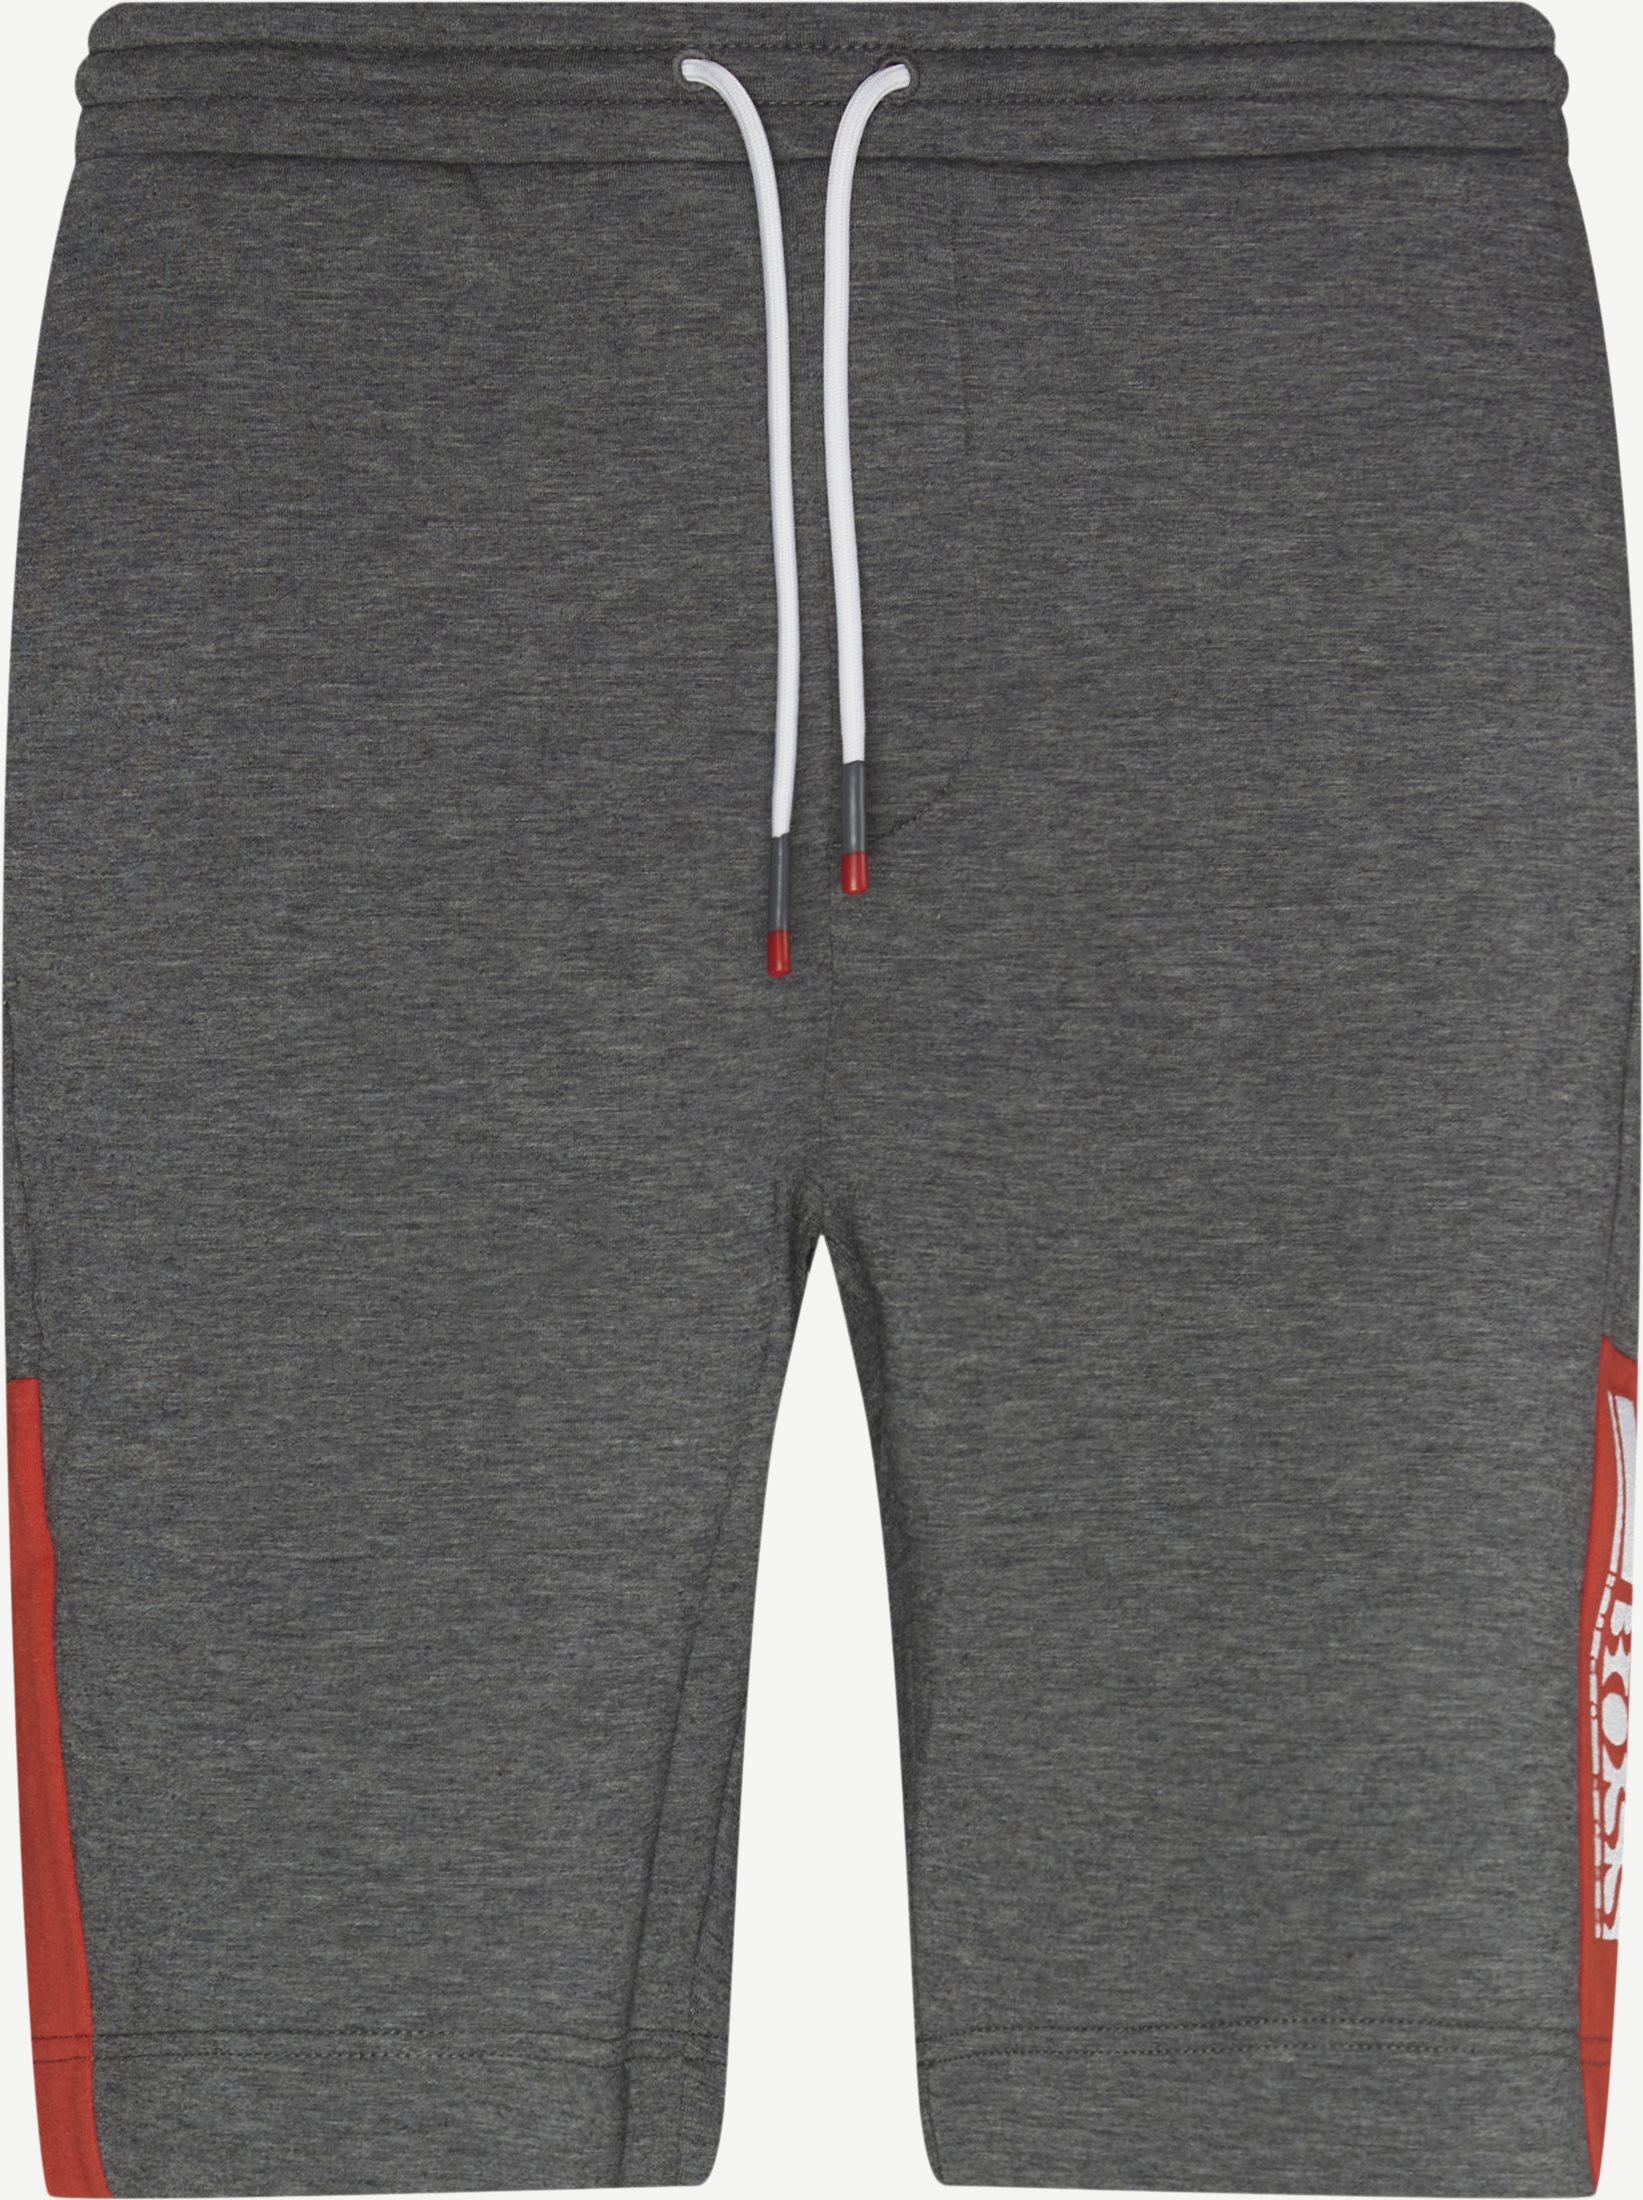 Shorts - Regular fit - Grau